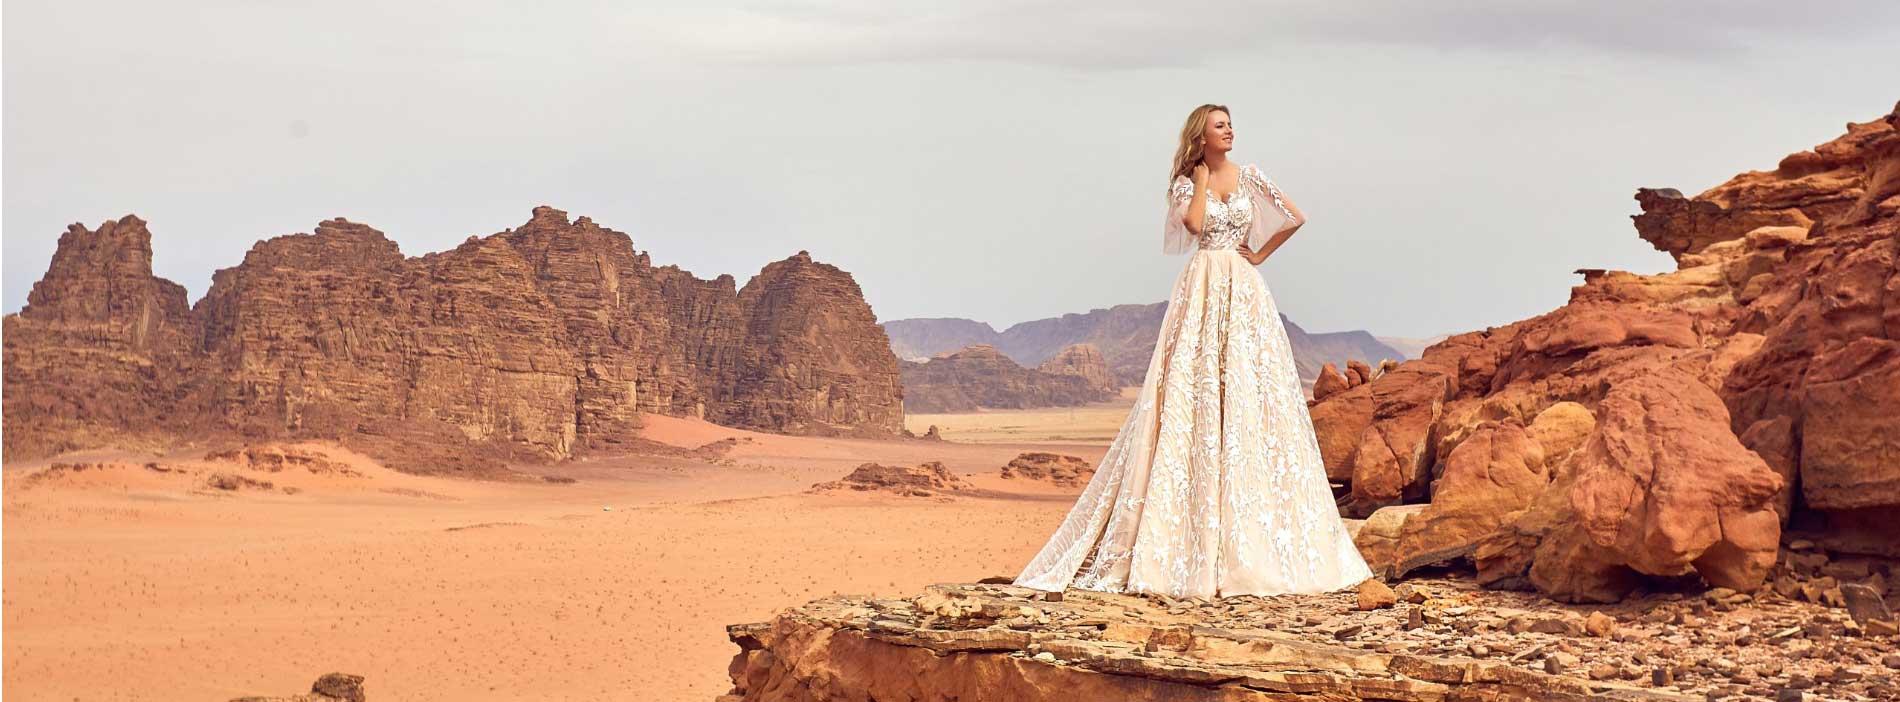 Robe Mariée Luxe